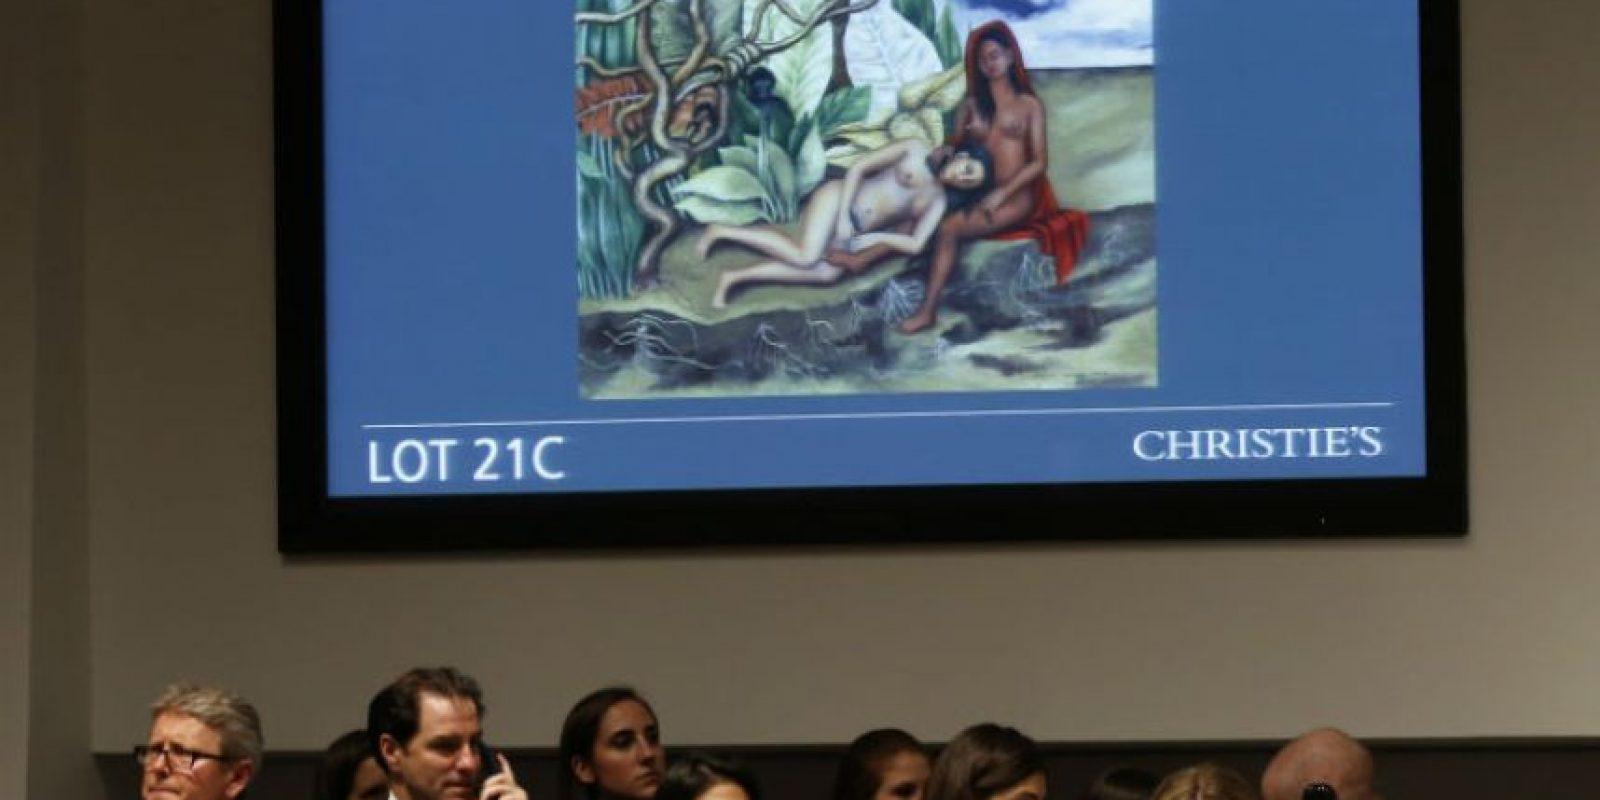 La artista le obsequió la obra de 1939 a su compatriota Dolores del Río Foto:AP